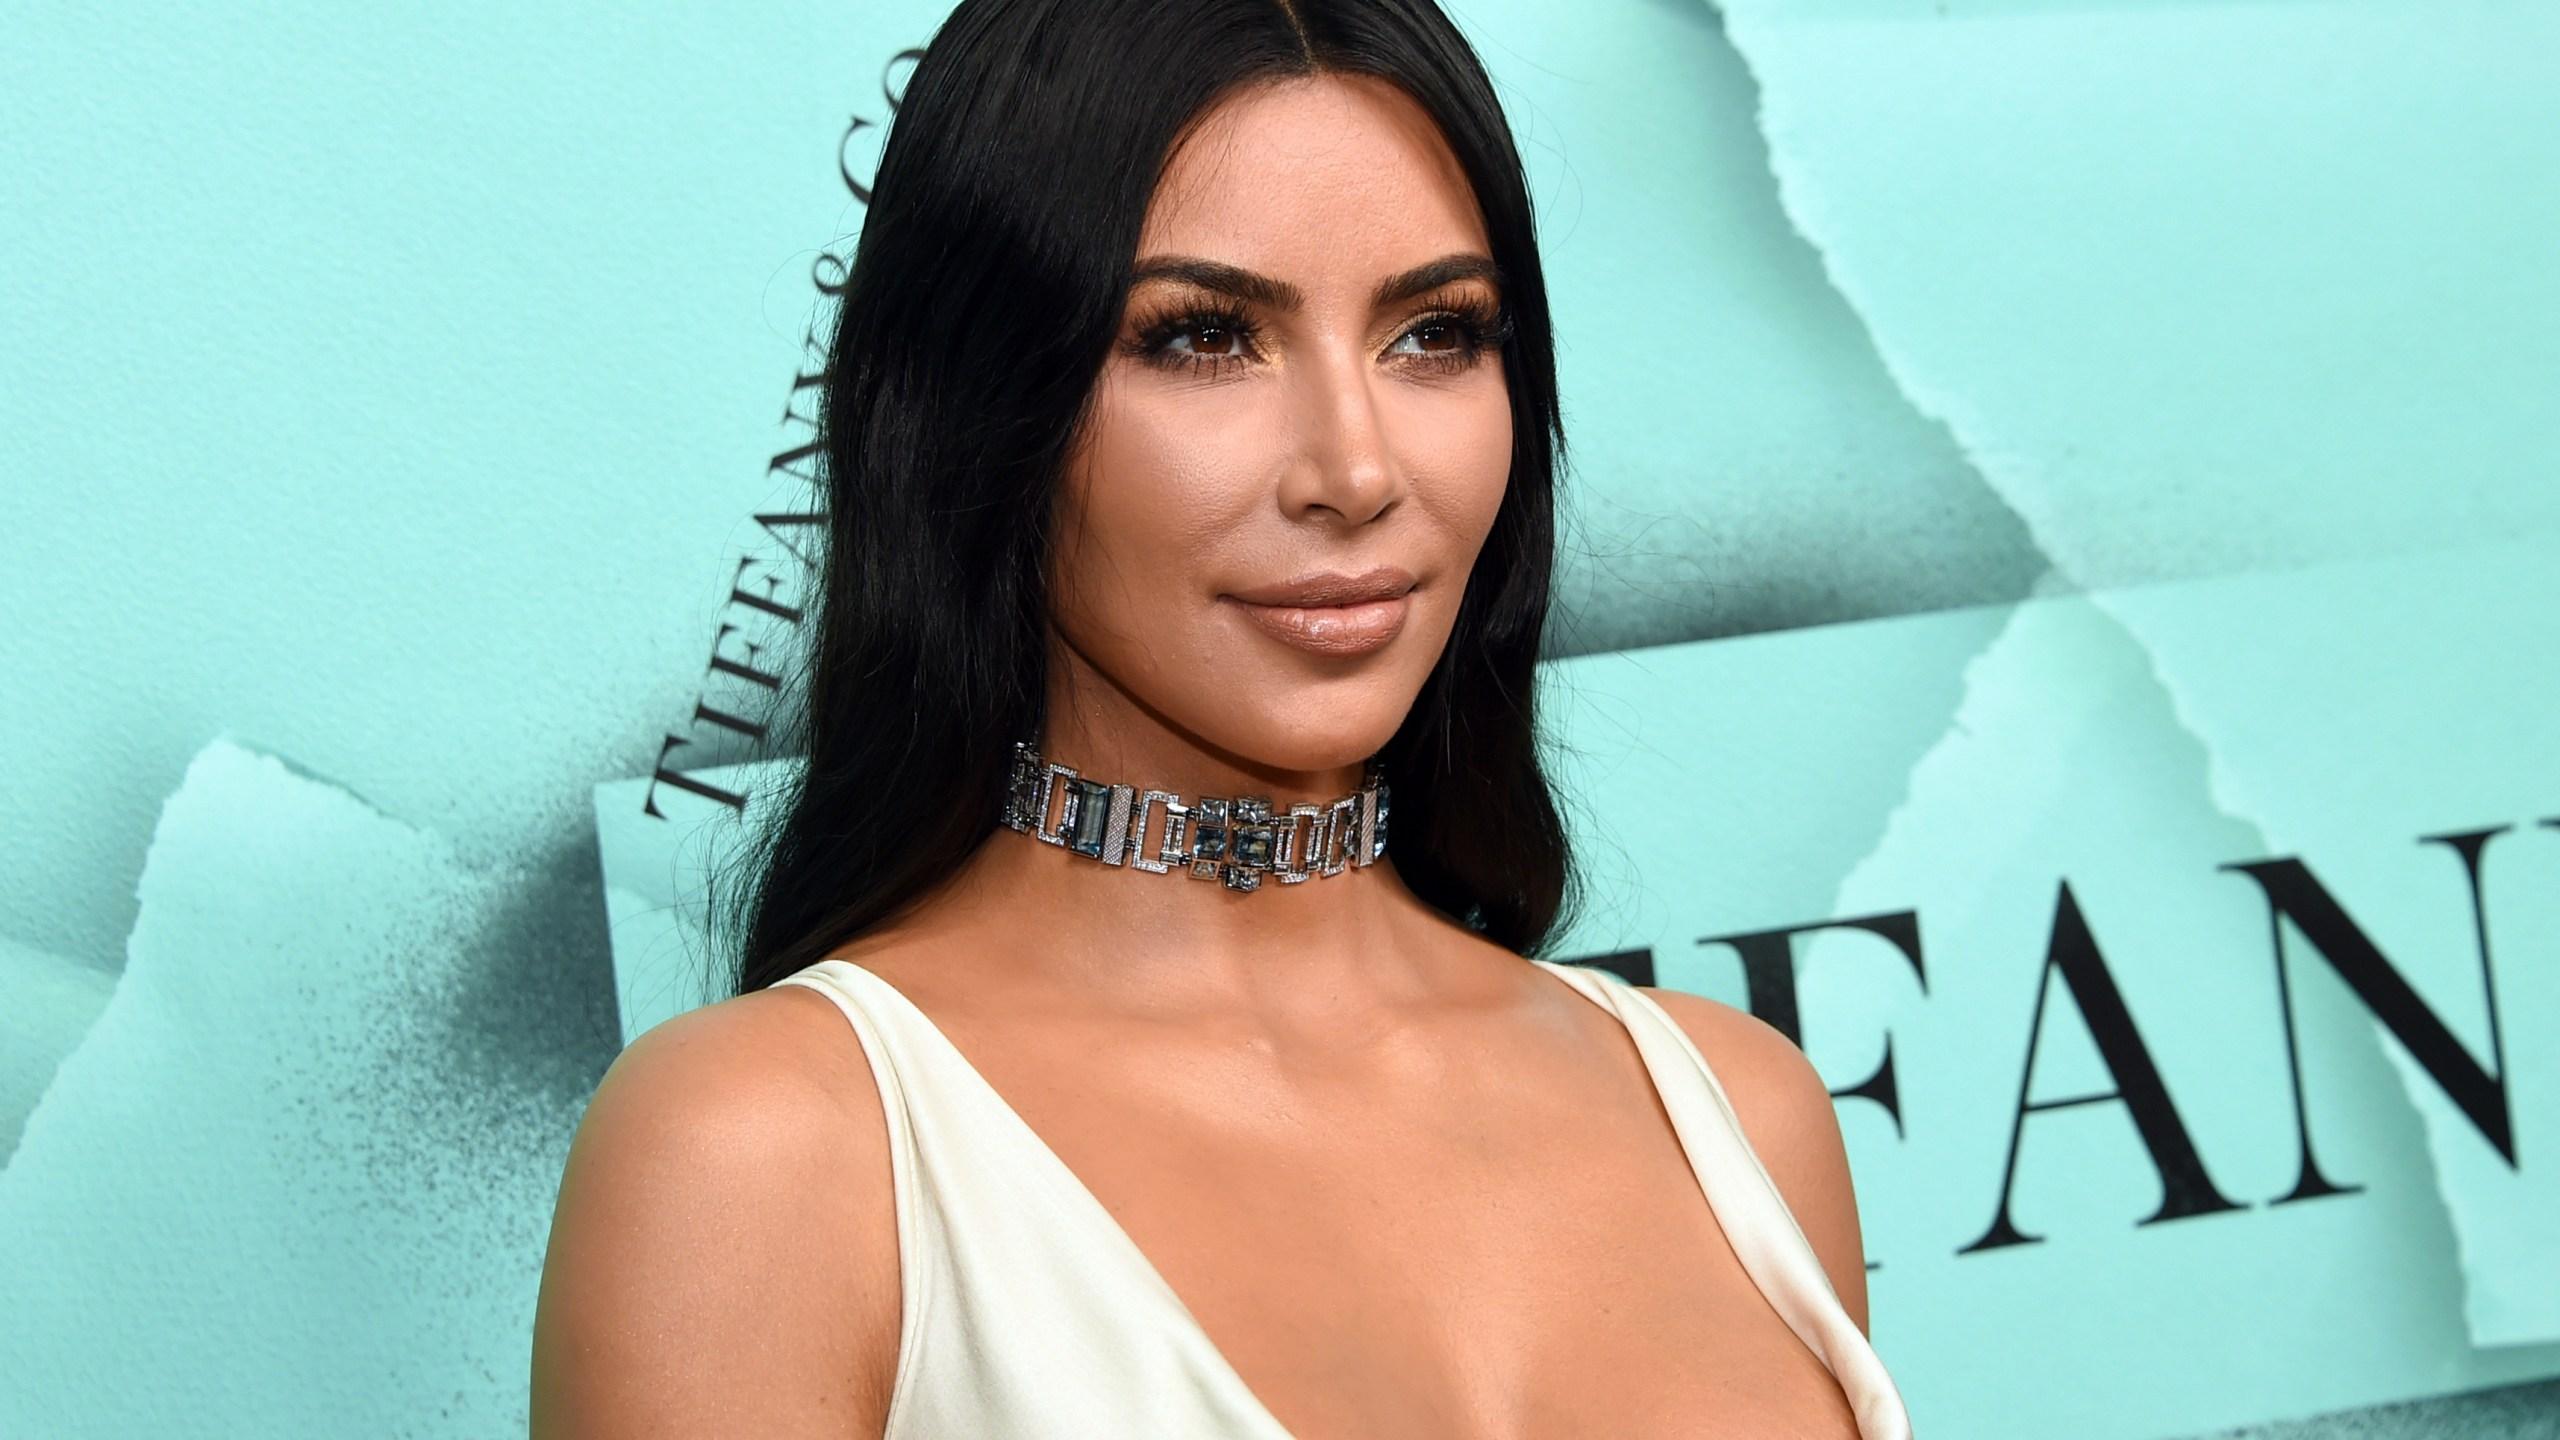 People-Kim_Kardashian_West_71579-159532.jpg43283064